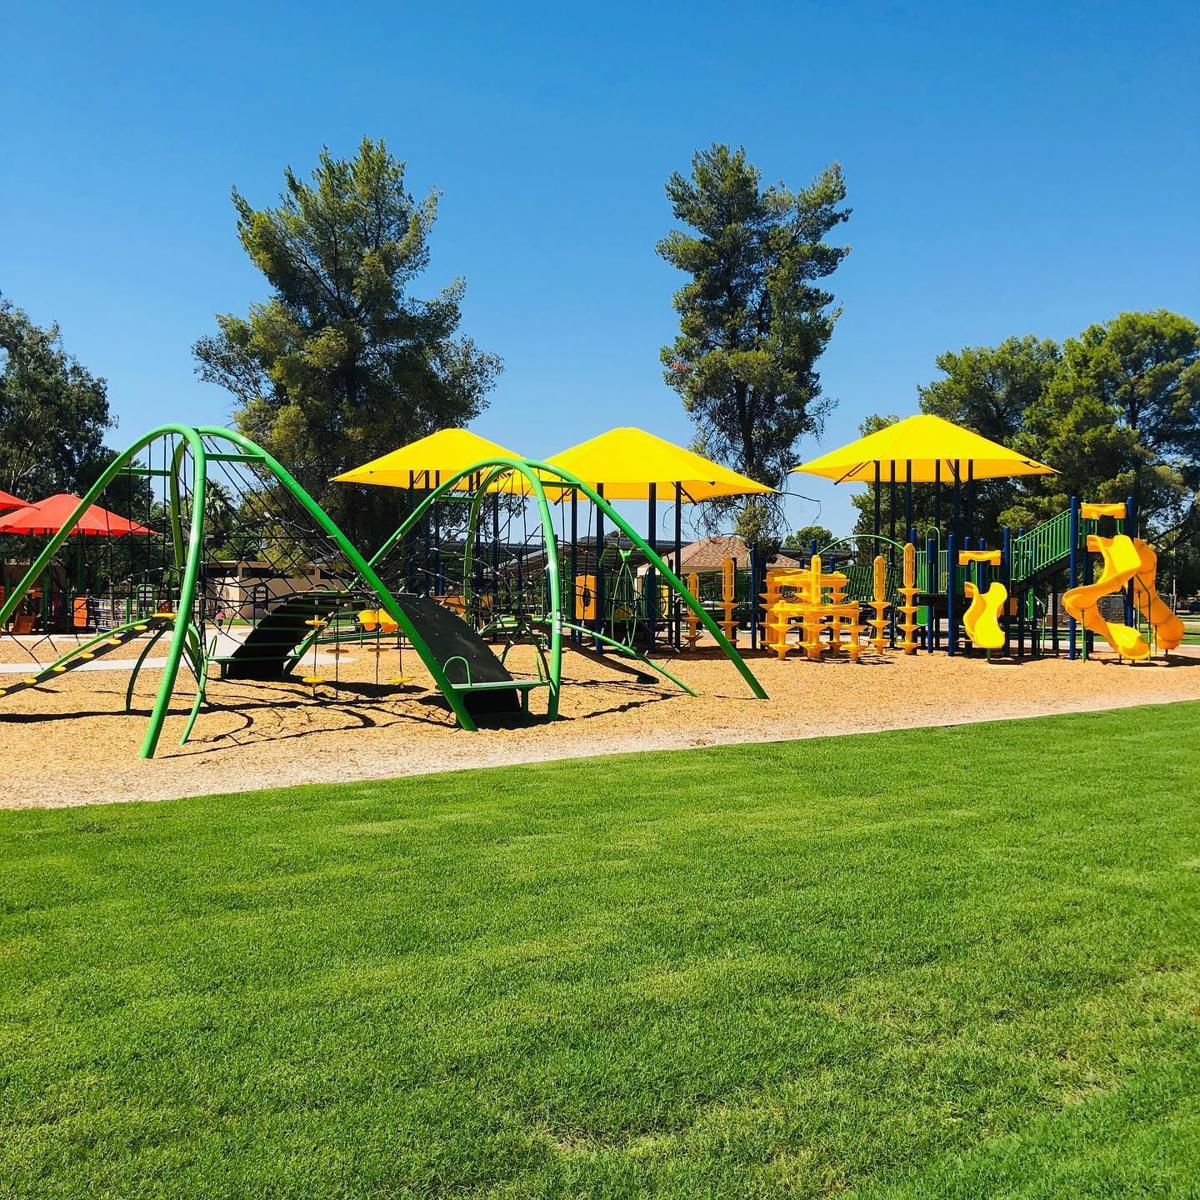 New Reid Park playground